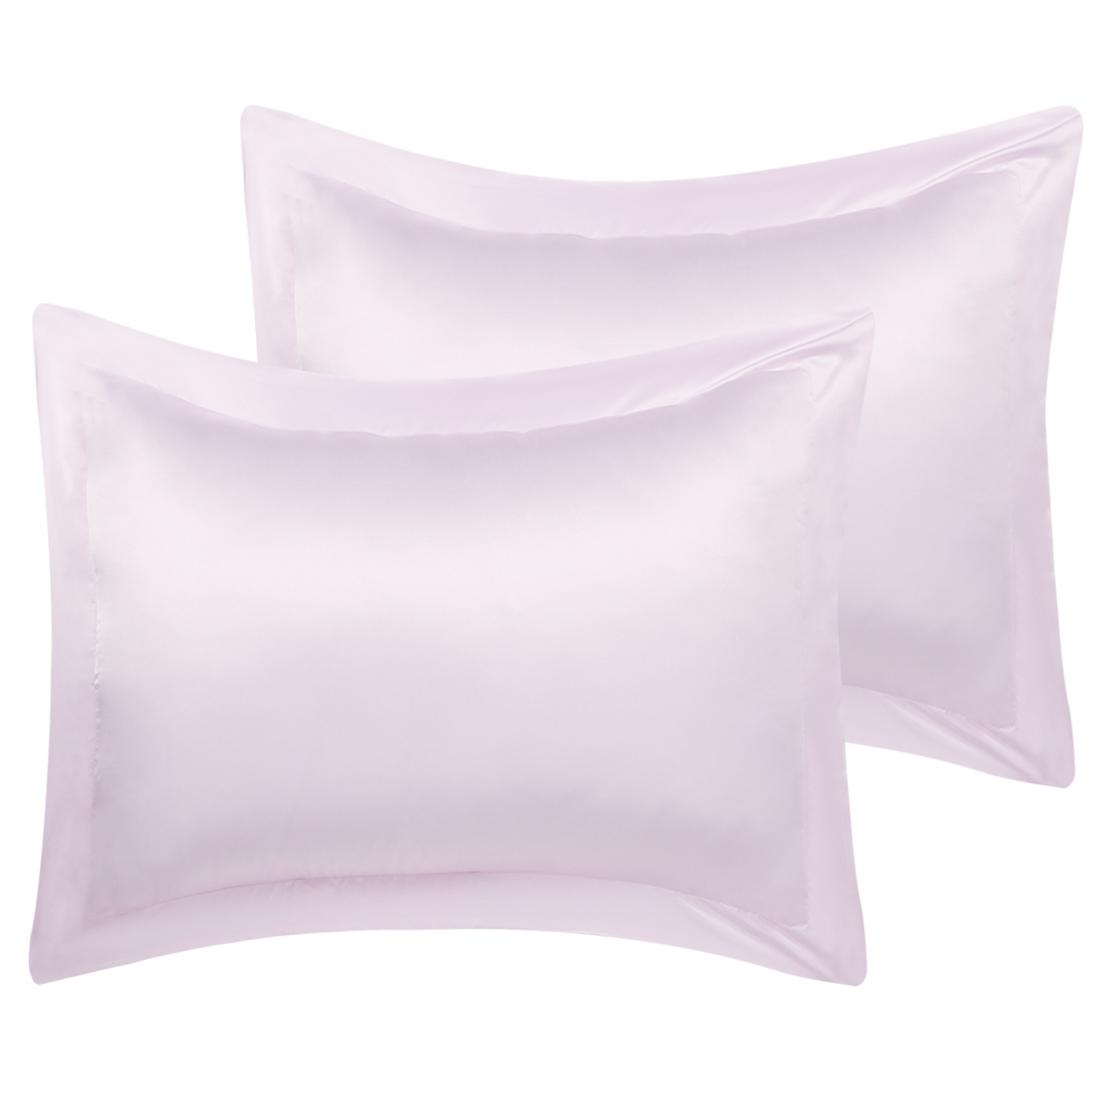 2 Pcs Lavender Gray Pillow Shams Satin Pillow Cases King Oxford Pillowcases